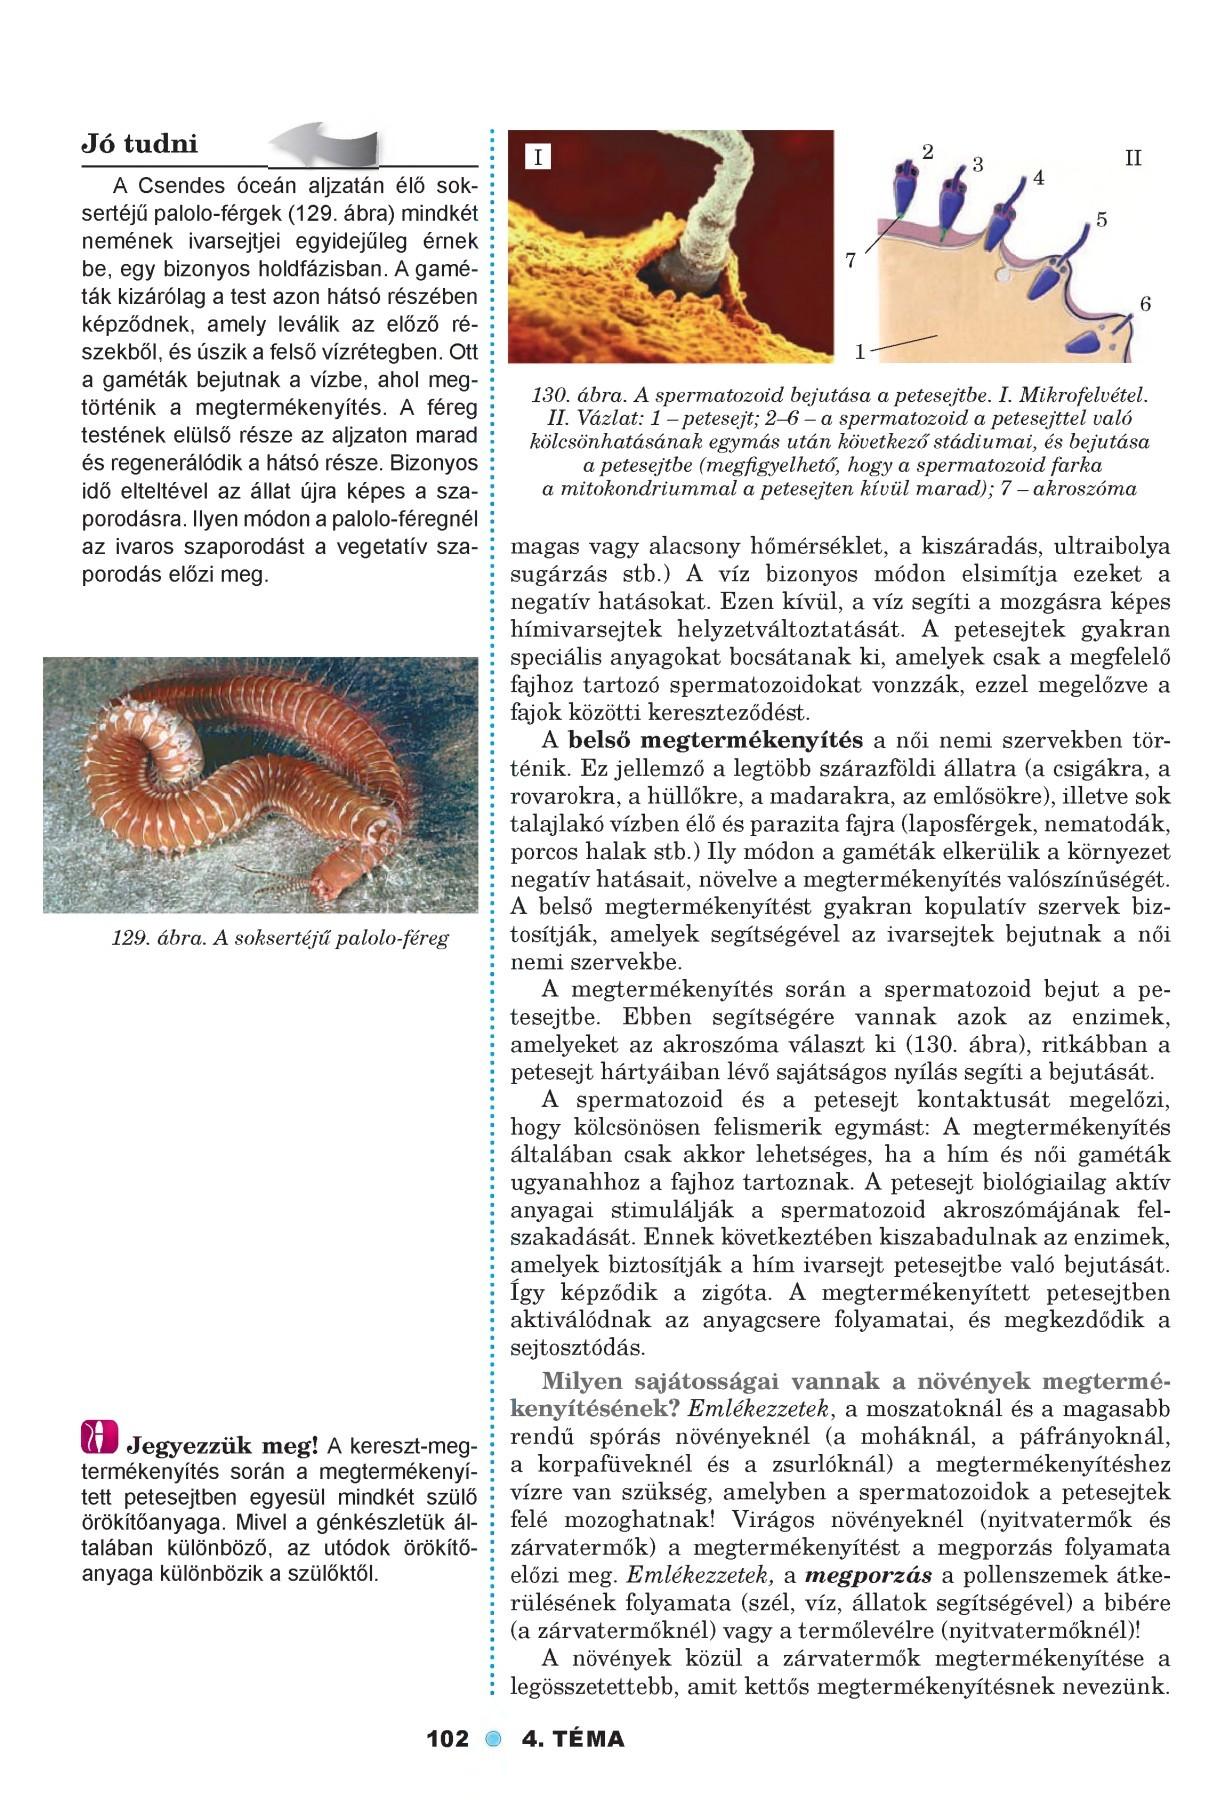 Mikrobák intracelluláris paraziták - talea-immobilien.hu